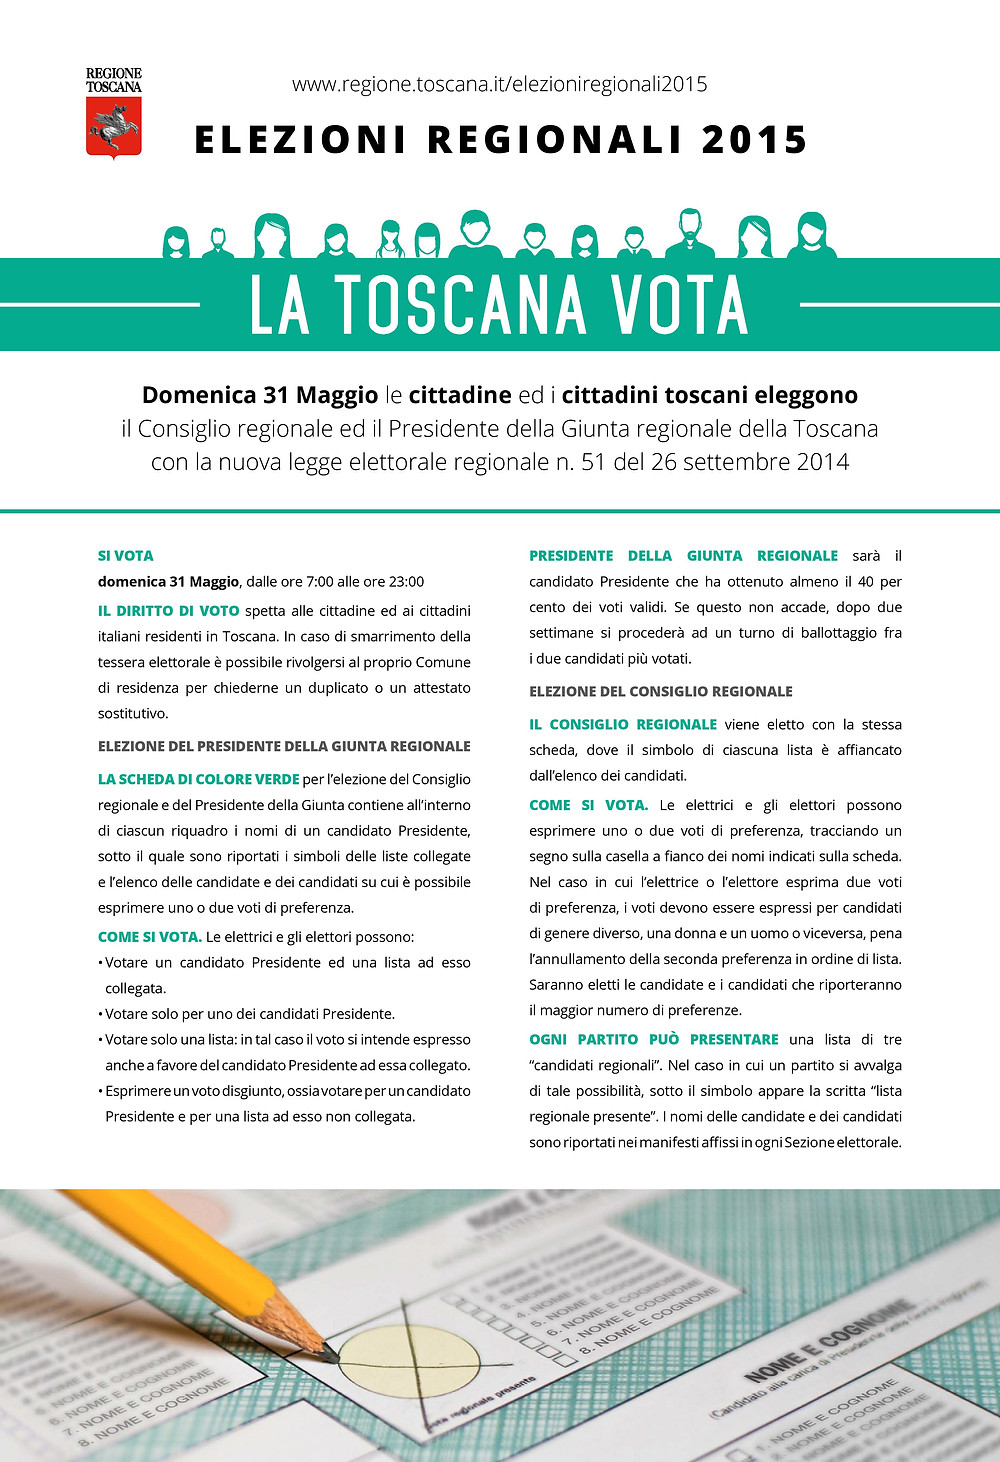 Elezioni2015_depliant_informativo-page-001.jpg